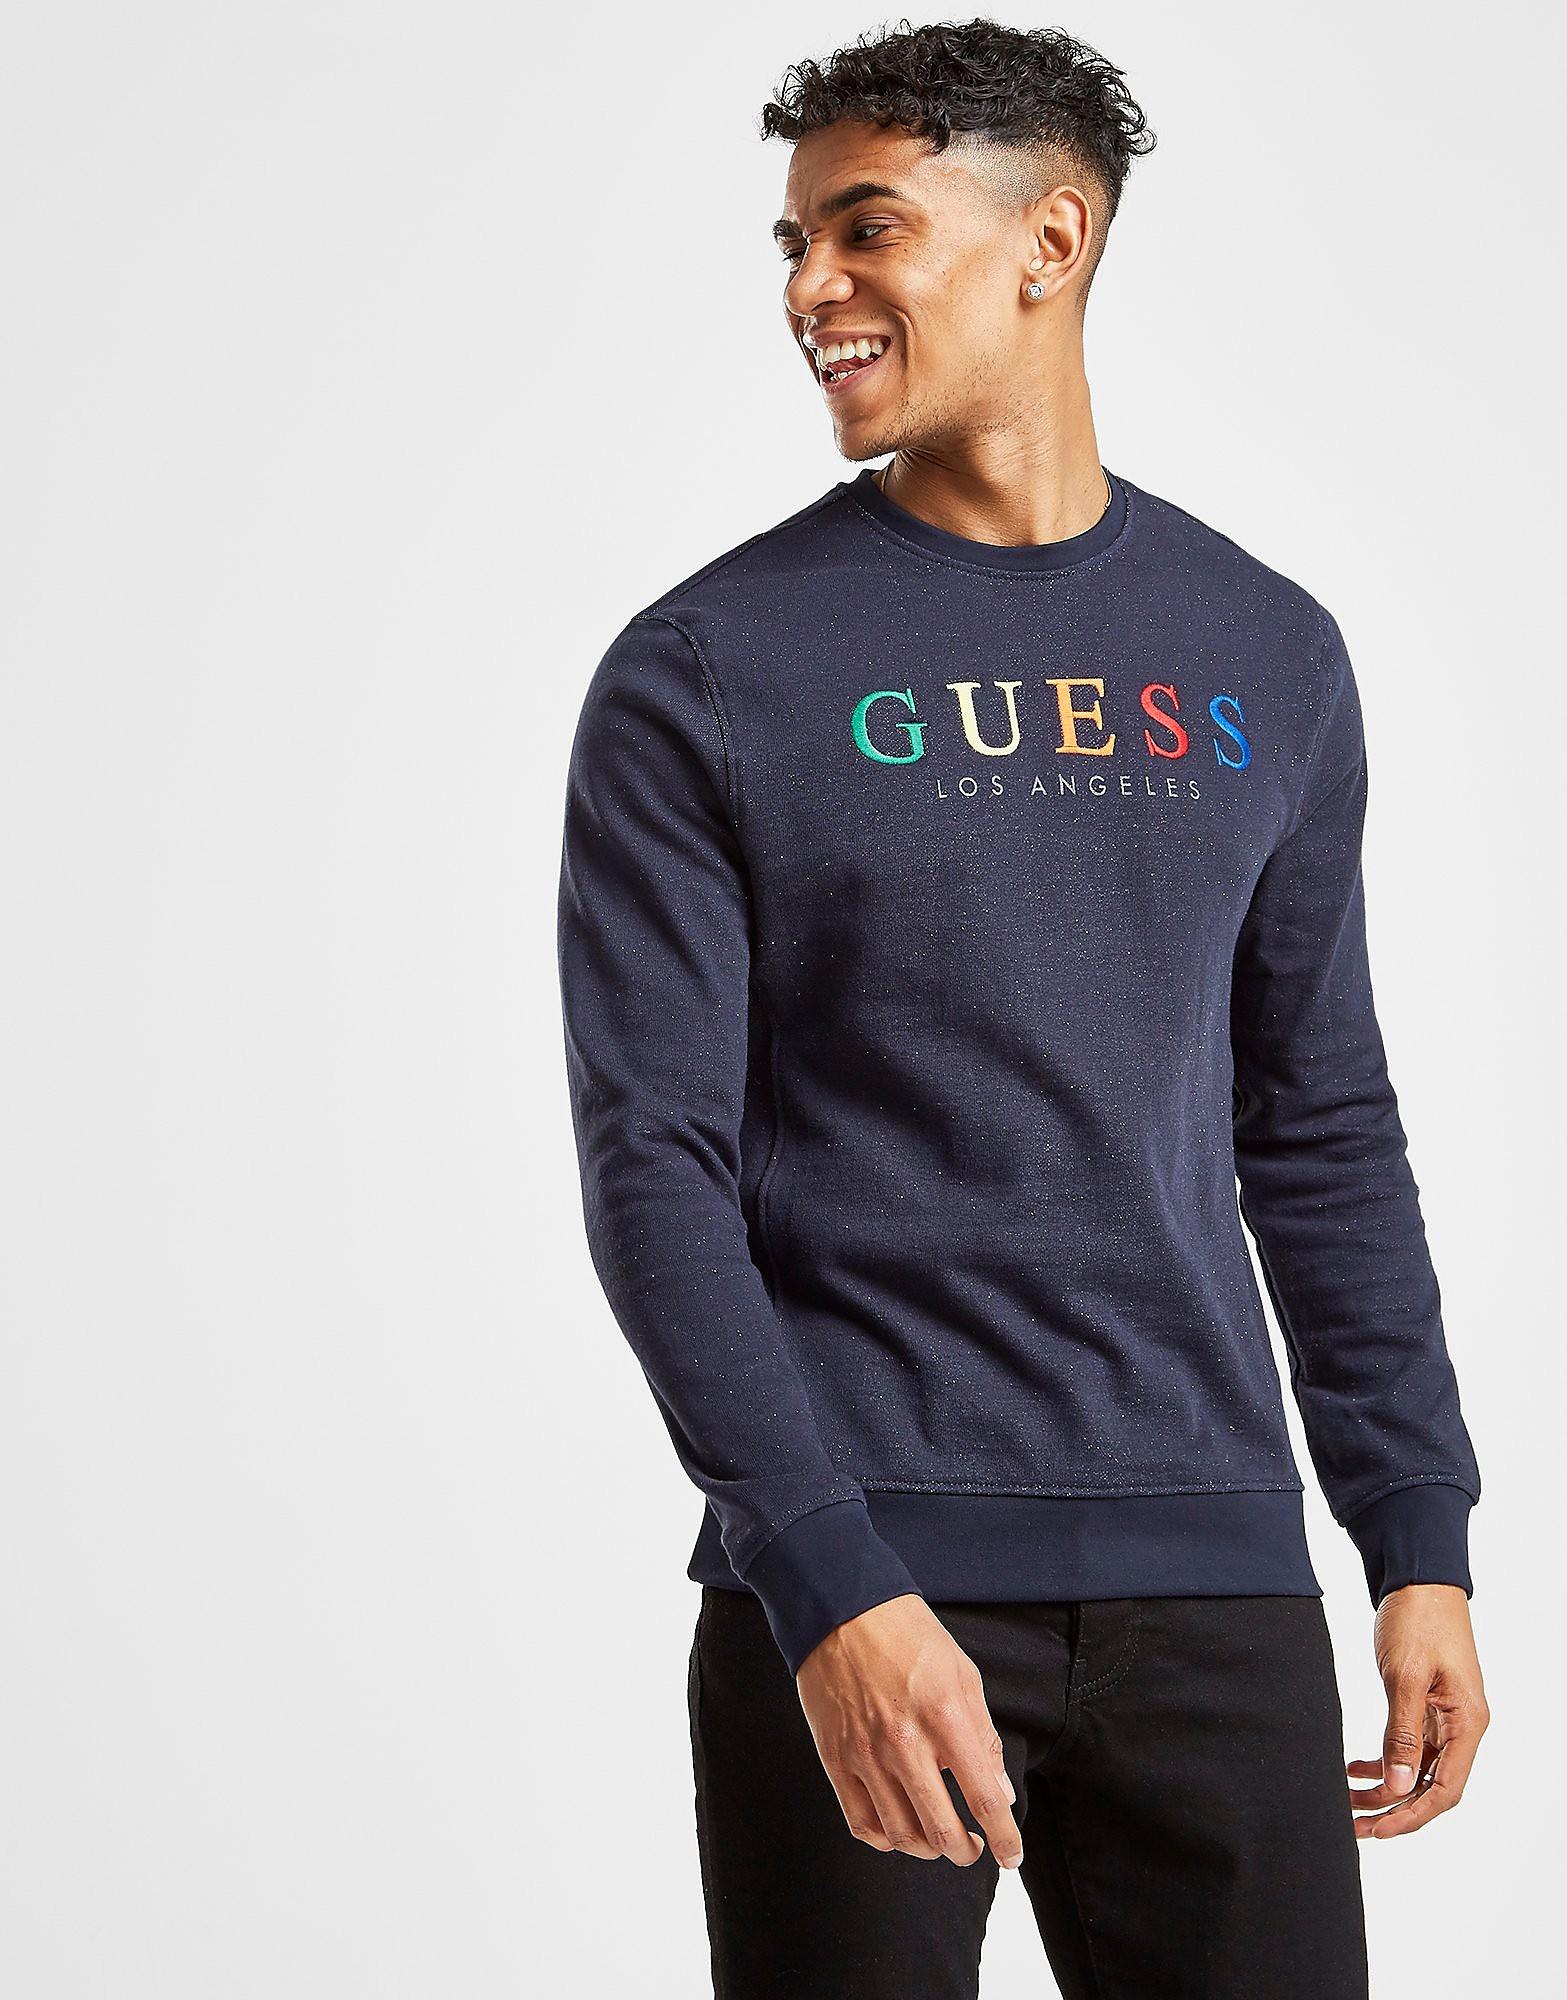 Guess Rainbow Crew Sweatshirt